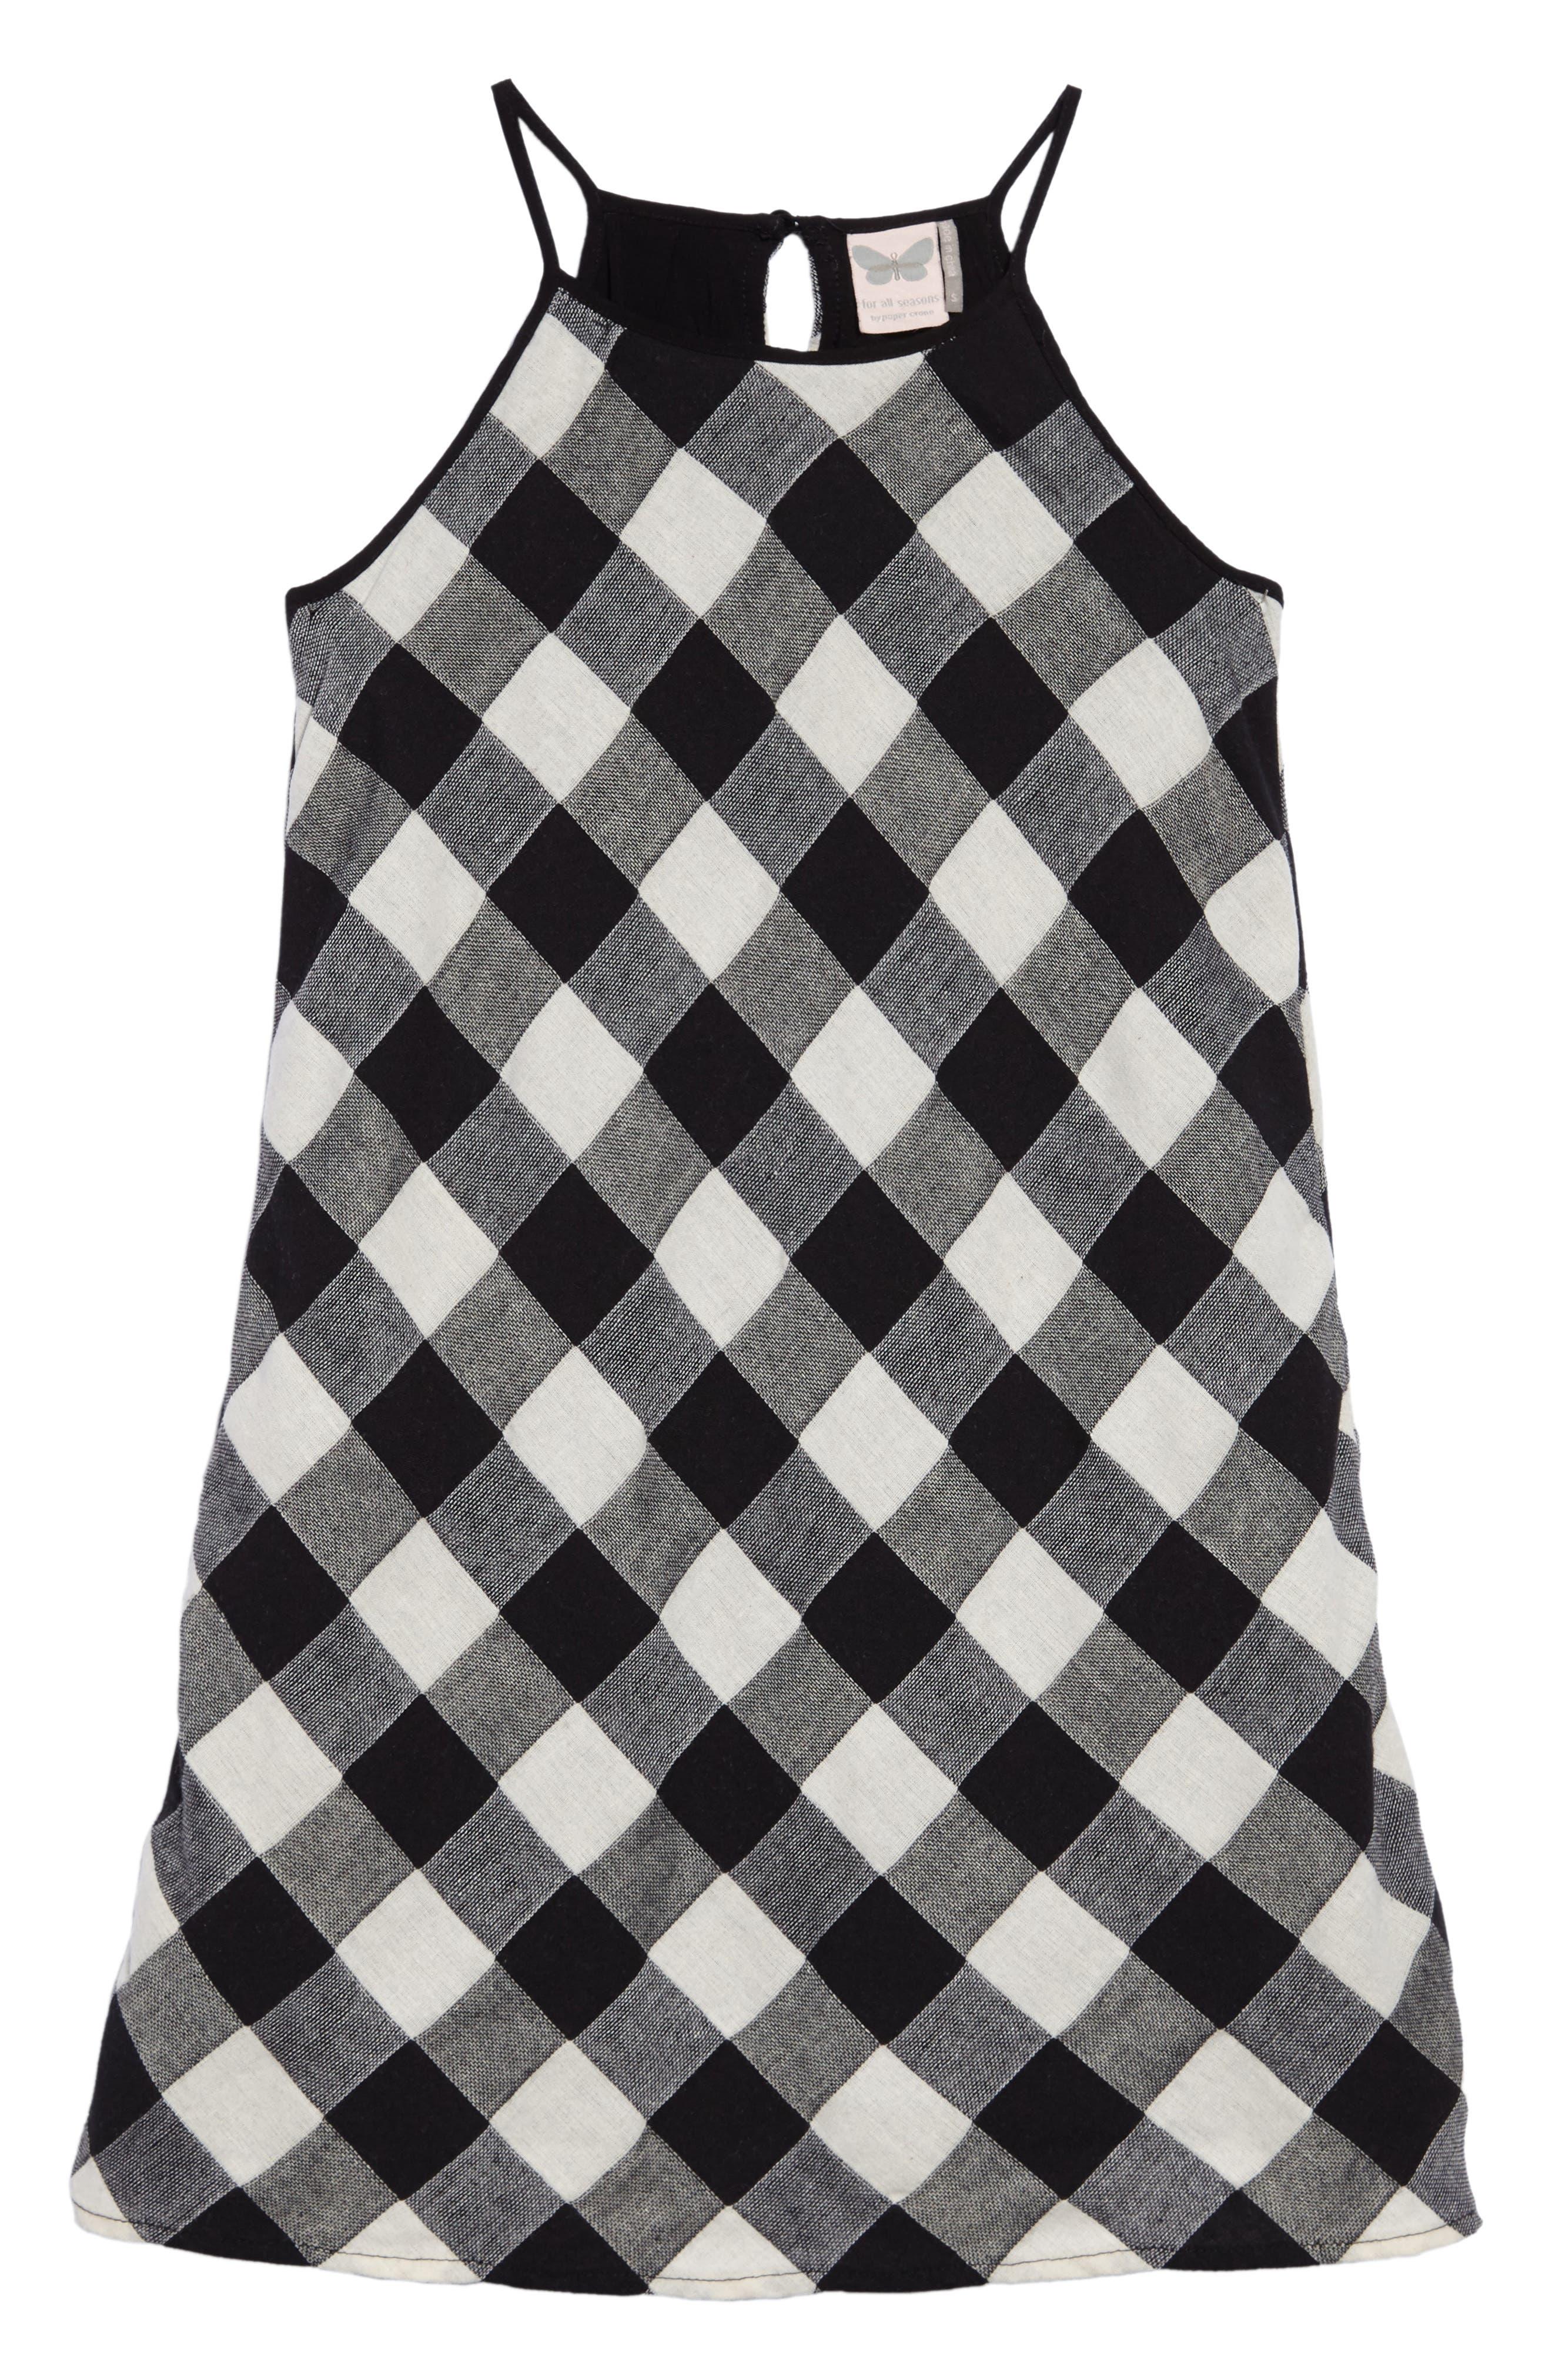 Main Image - For All Seasons Gingham Tank Dress (Big Girls)